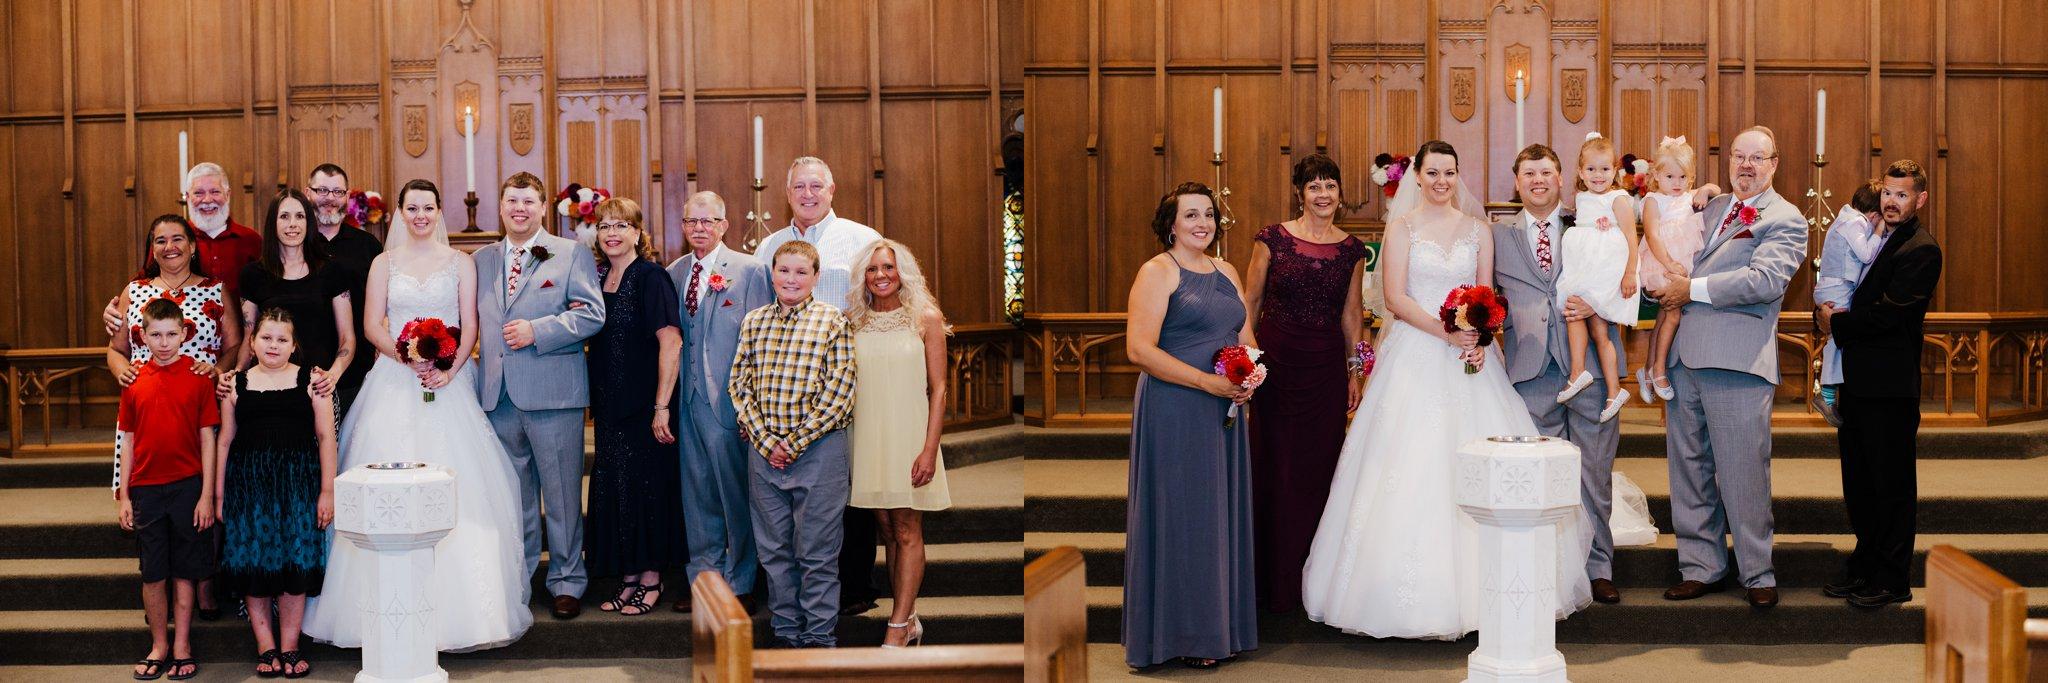 Wisconsin Wedding Photographer_6449.jpg